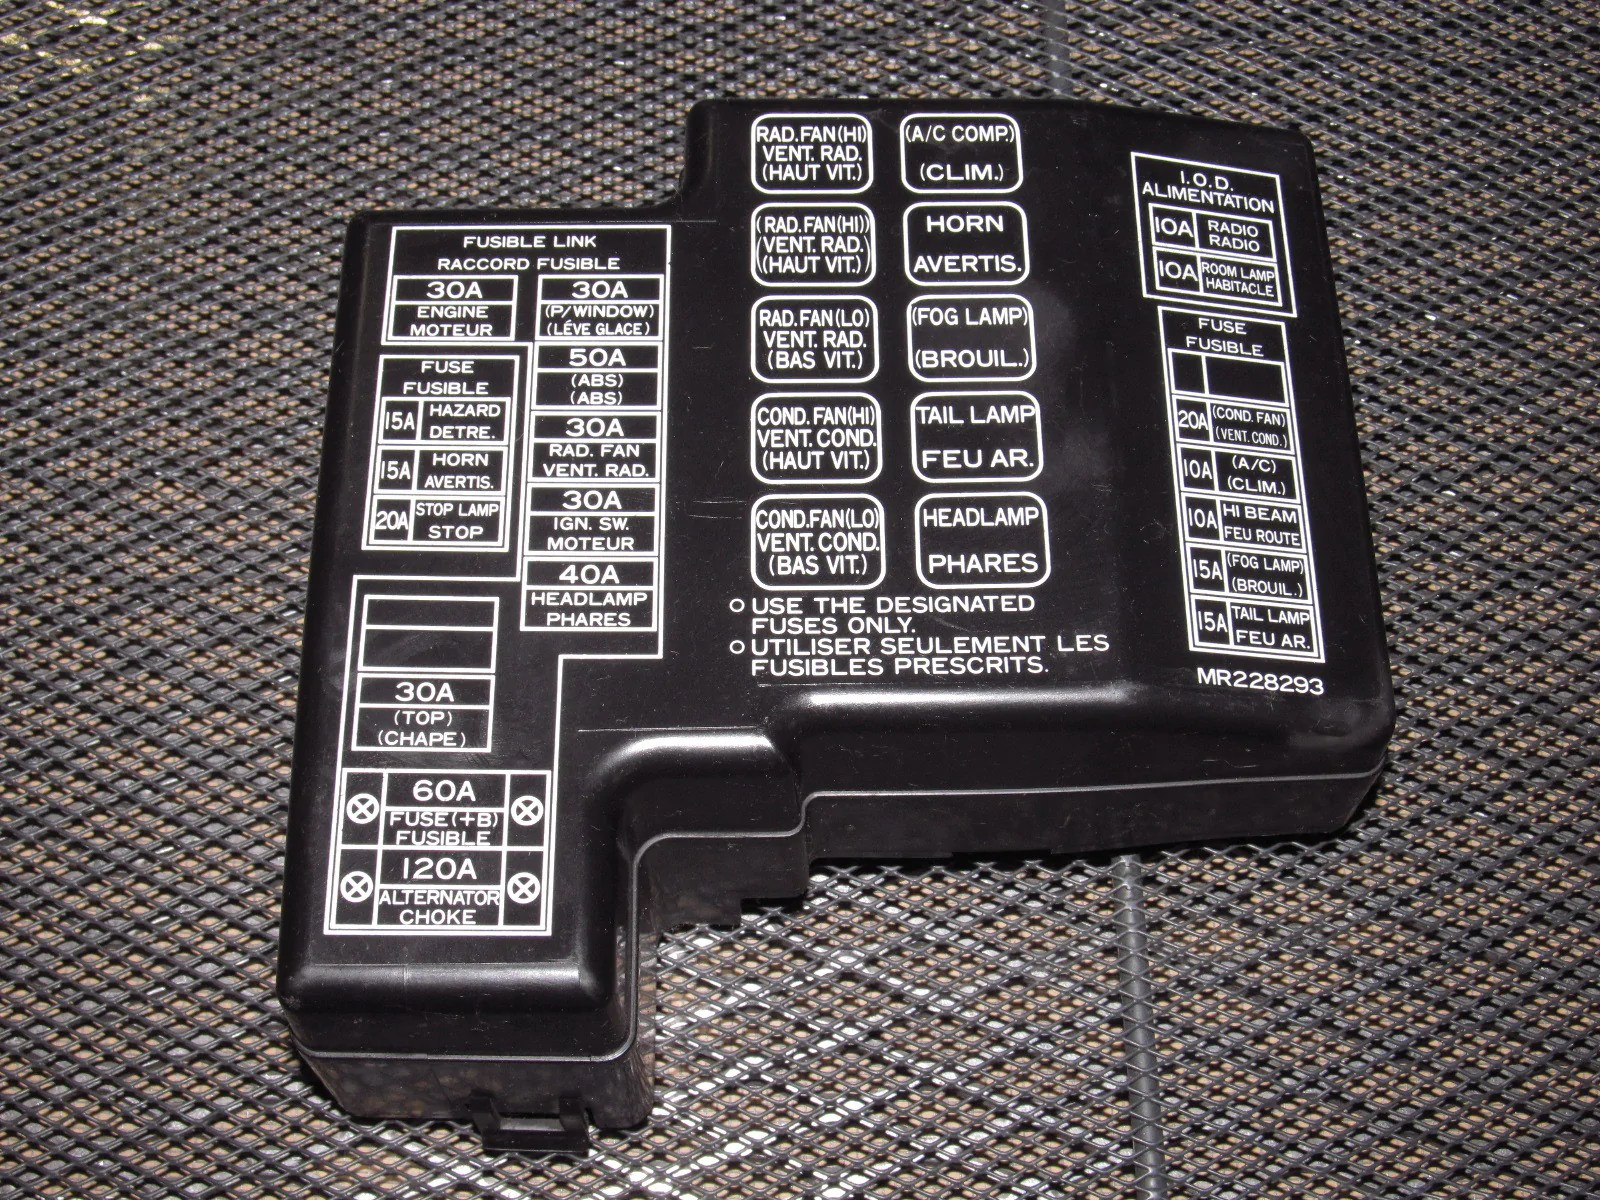 hight resolution of 97 98 99 mitsubishi eclipse oem engine fuse box cover autopartone com rh autopartone com 1998